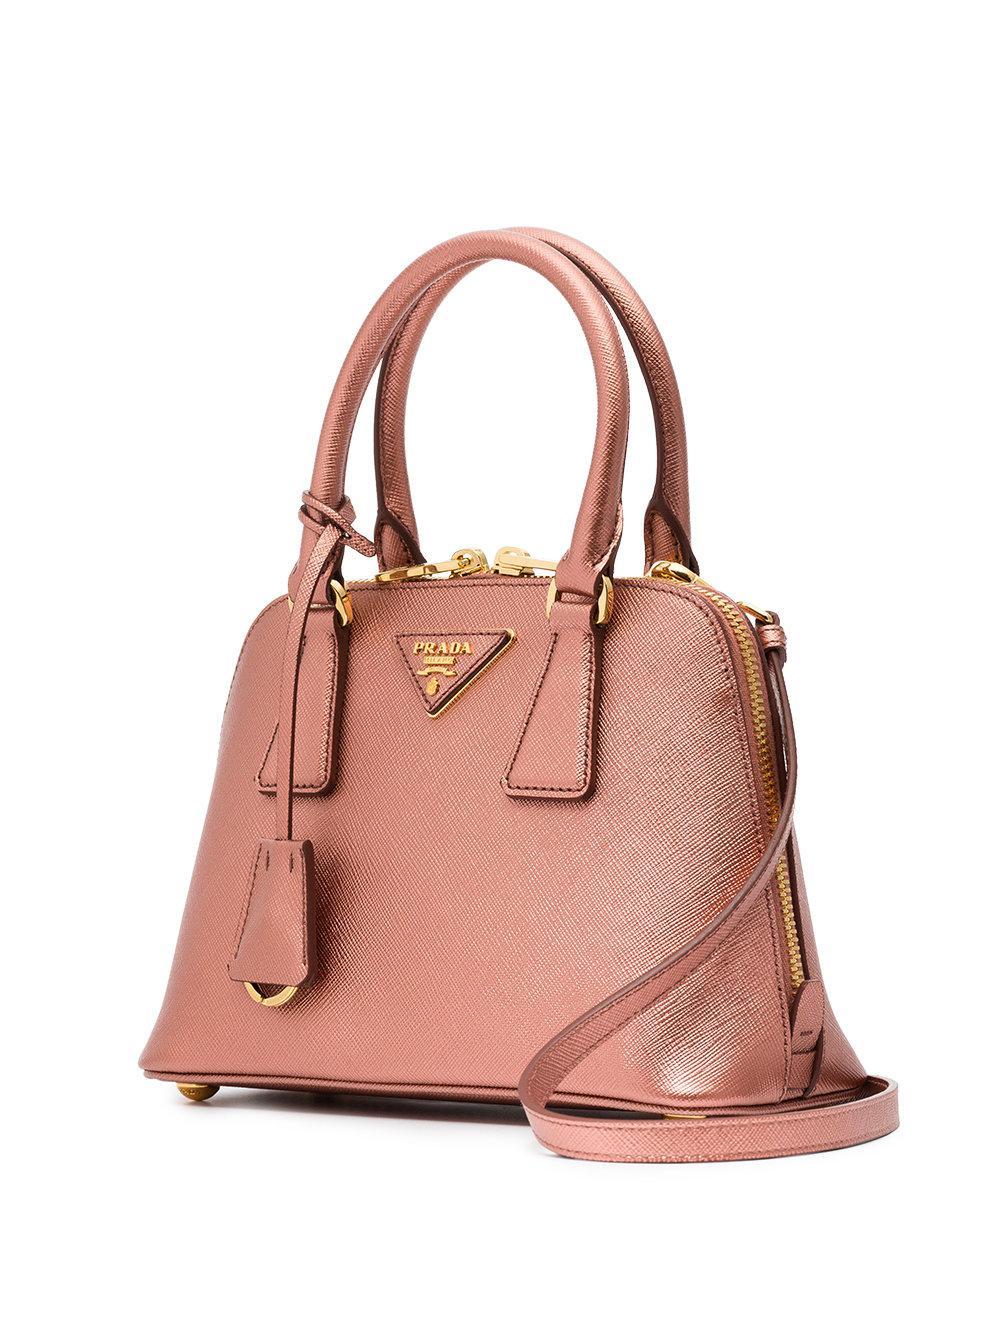 3efec79ac888 Lyst - Prada Pink Promenade Mini Leather Bag in Pink